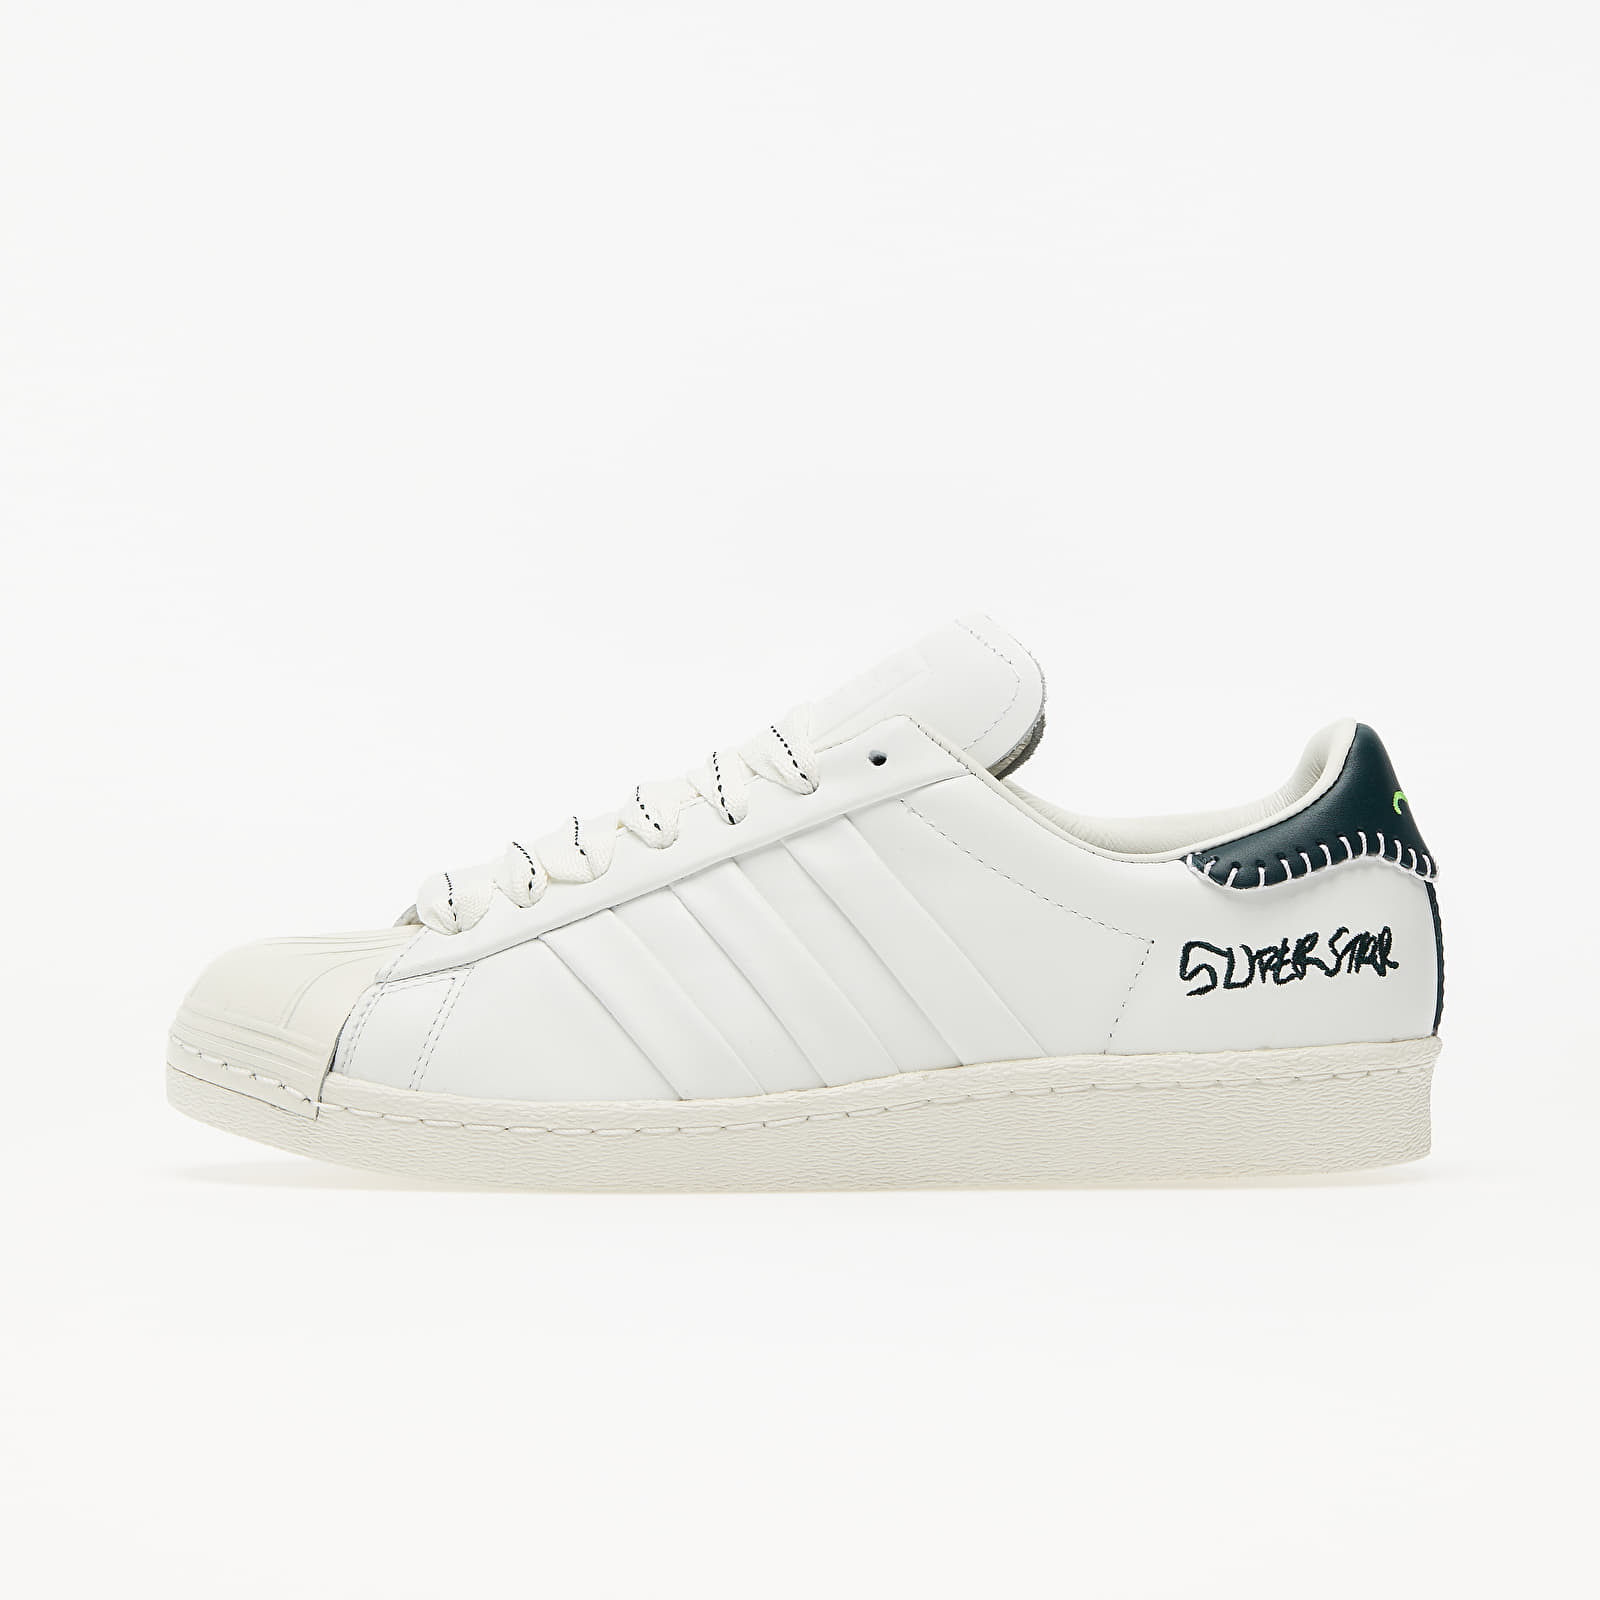 Pánske tenisky a topánky adidas x Jonah Hill Superstar Core White/ Green Night F17/ Off White